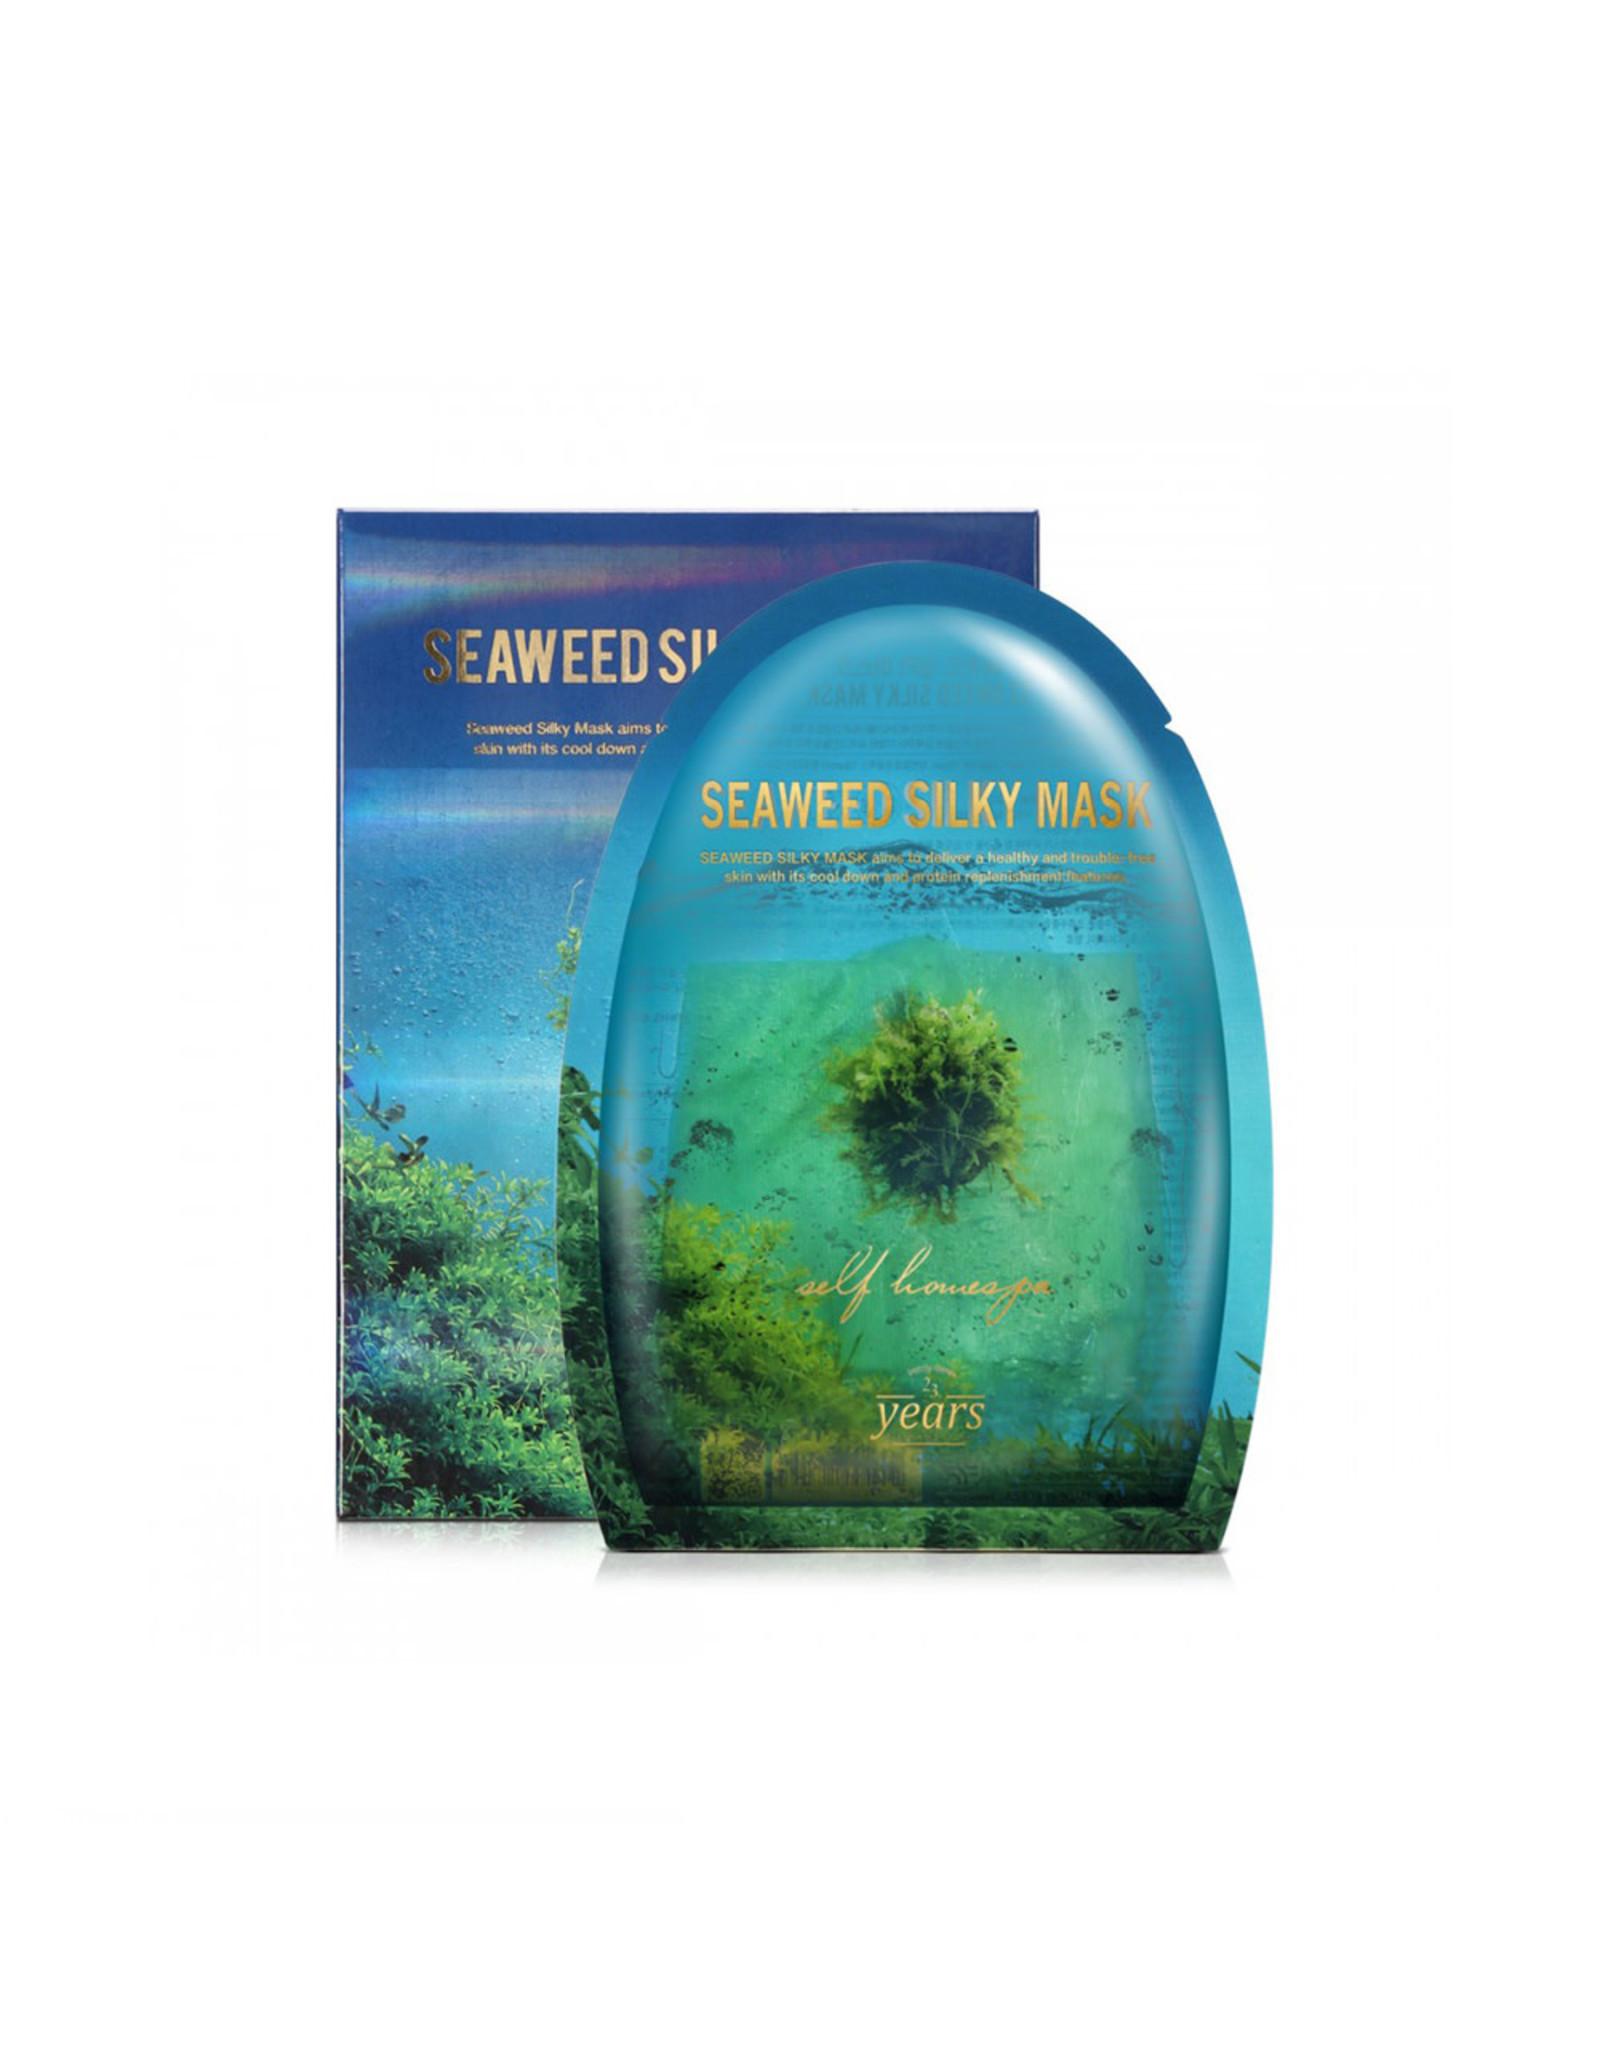 23 Years old 23 Years Old Seaweed Silky Mask Box